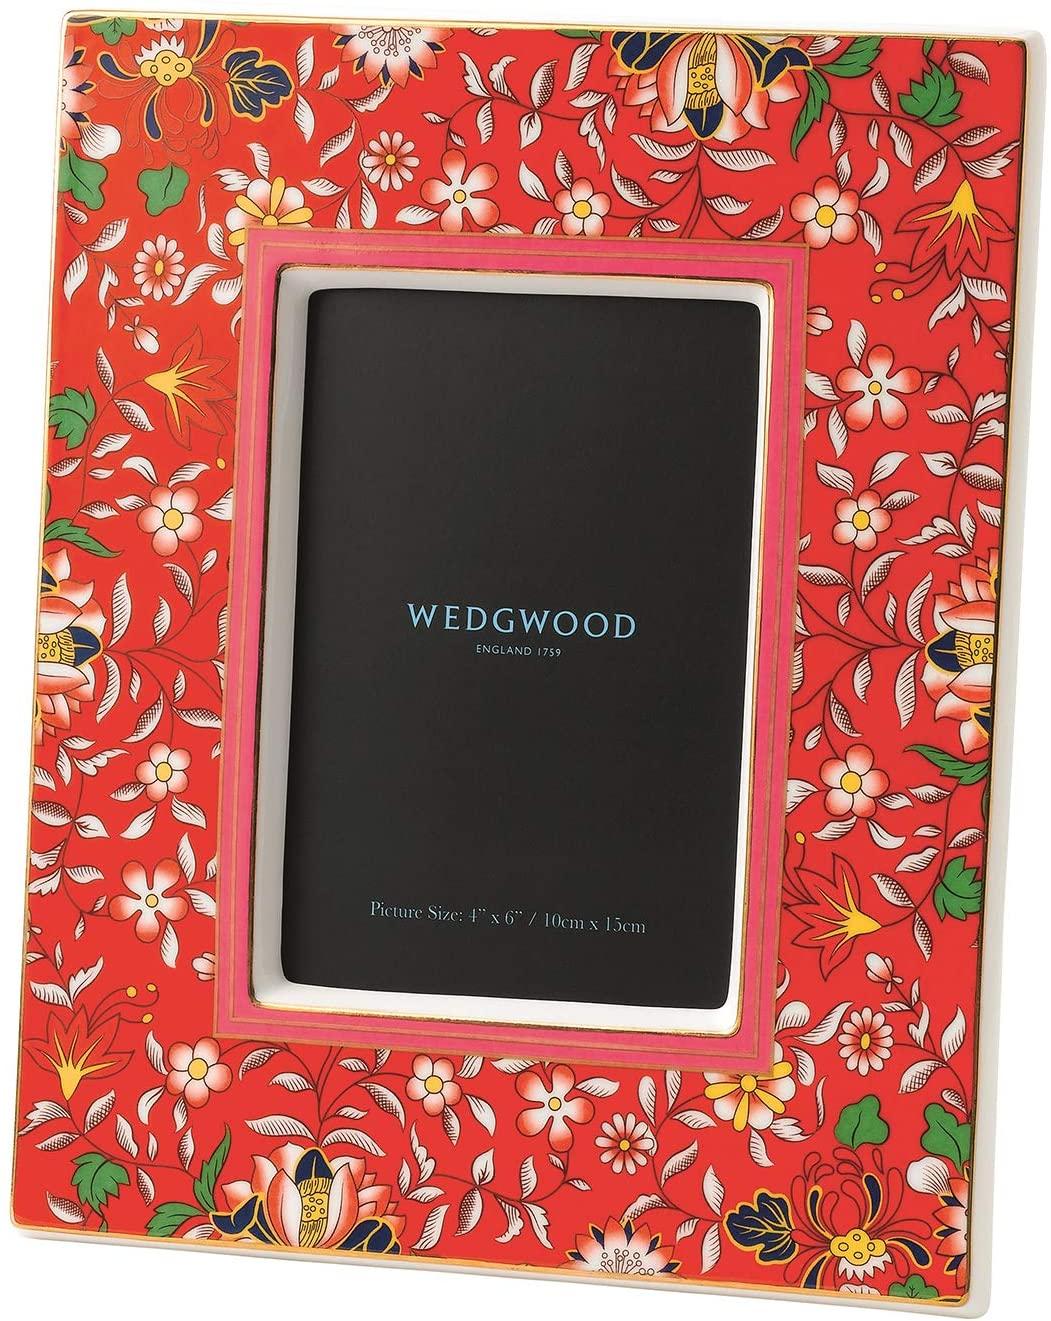 Wedgwood Wonderlust Frame 4x6 Crimson Jewel, 4 x 6